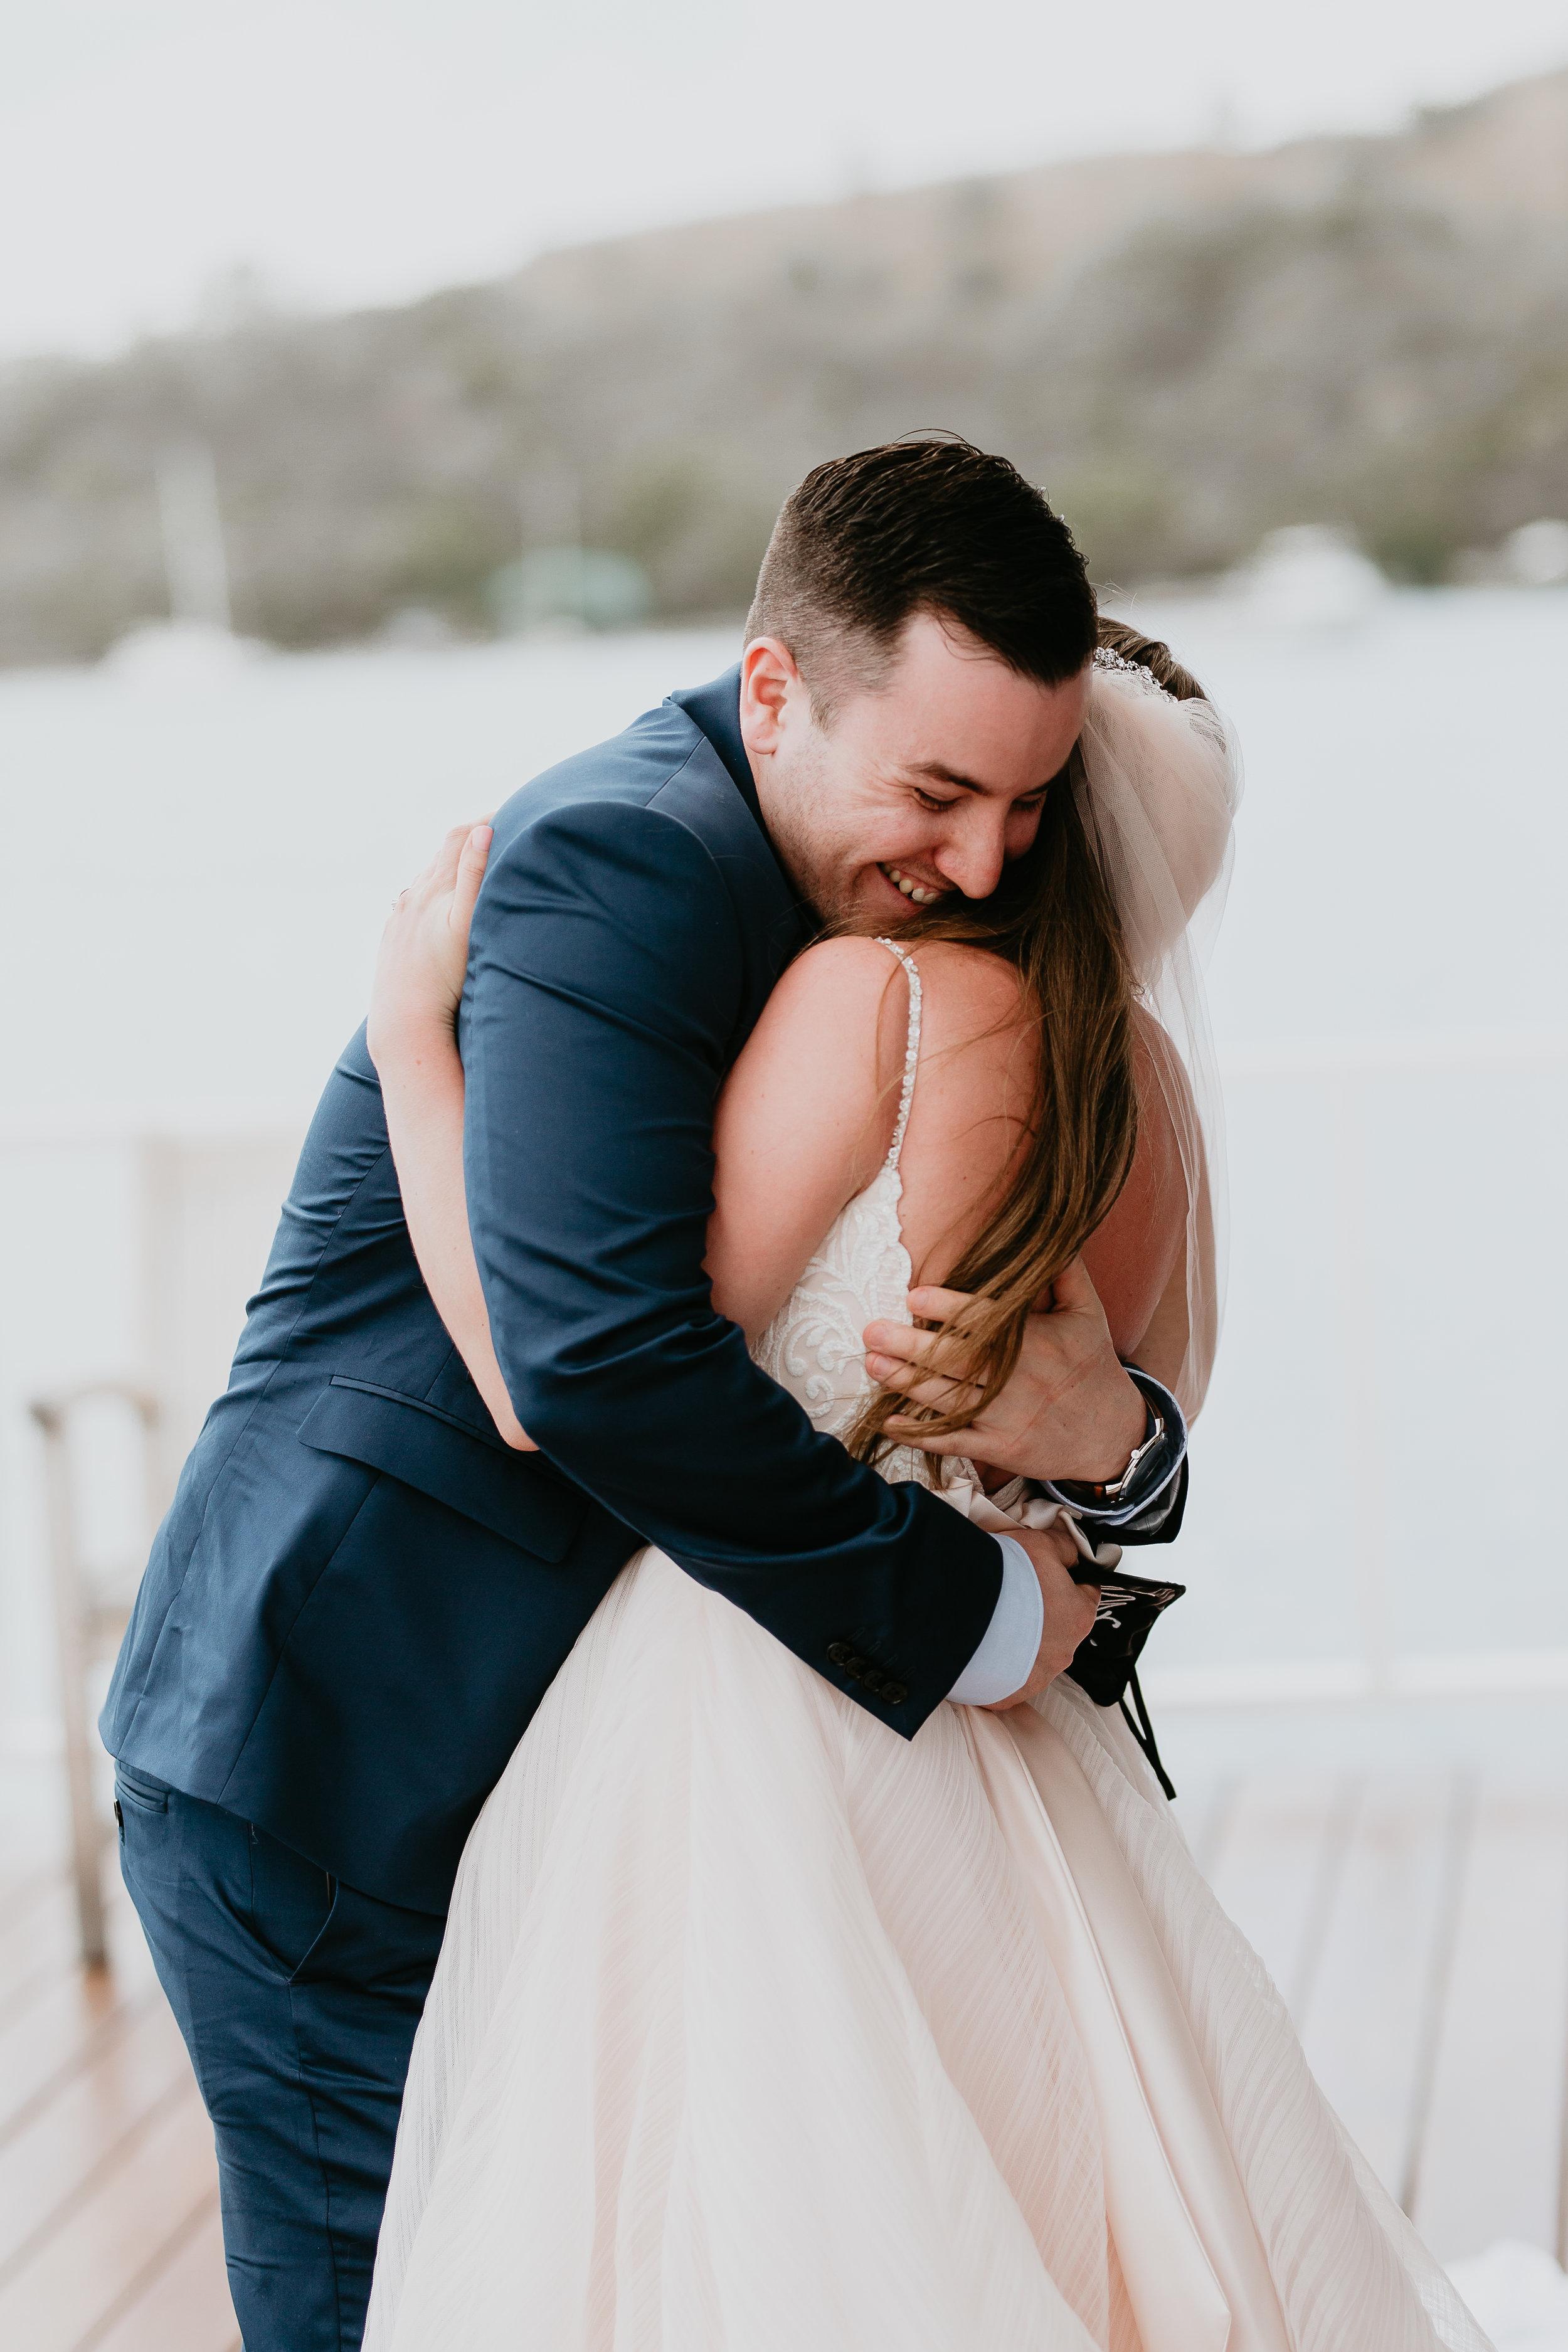 nicole-daacke-photography-destination-wedding-in-st-lucia-sandals-la-toc-intimate-island-wedding-carribean-elopement-photographer-chill-island-wedding-32.jpg